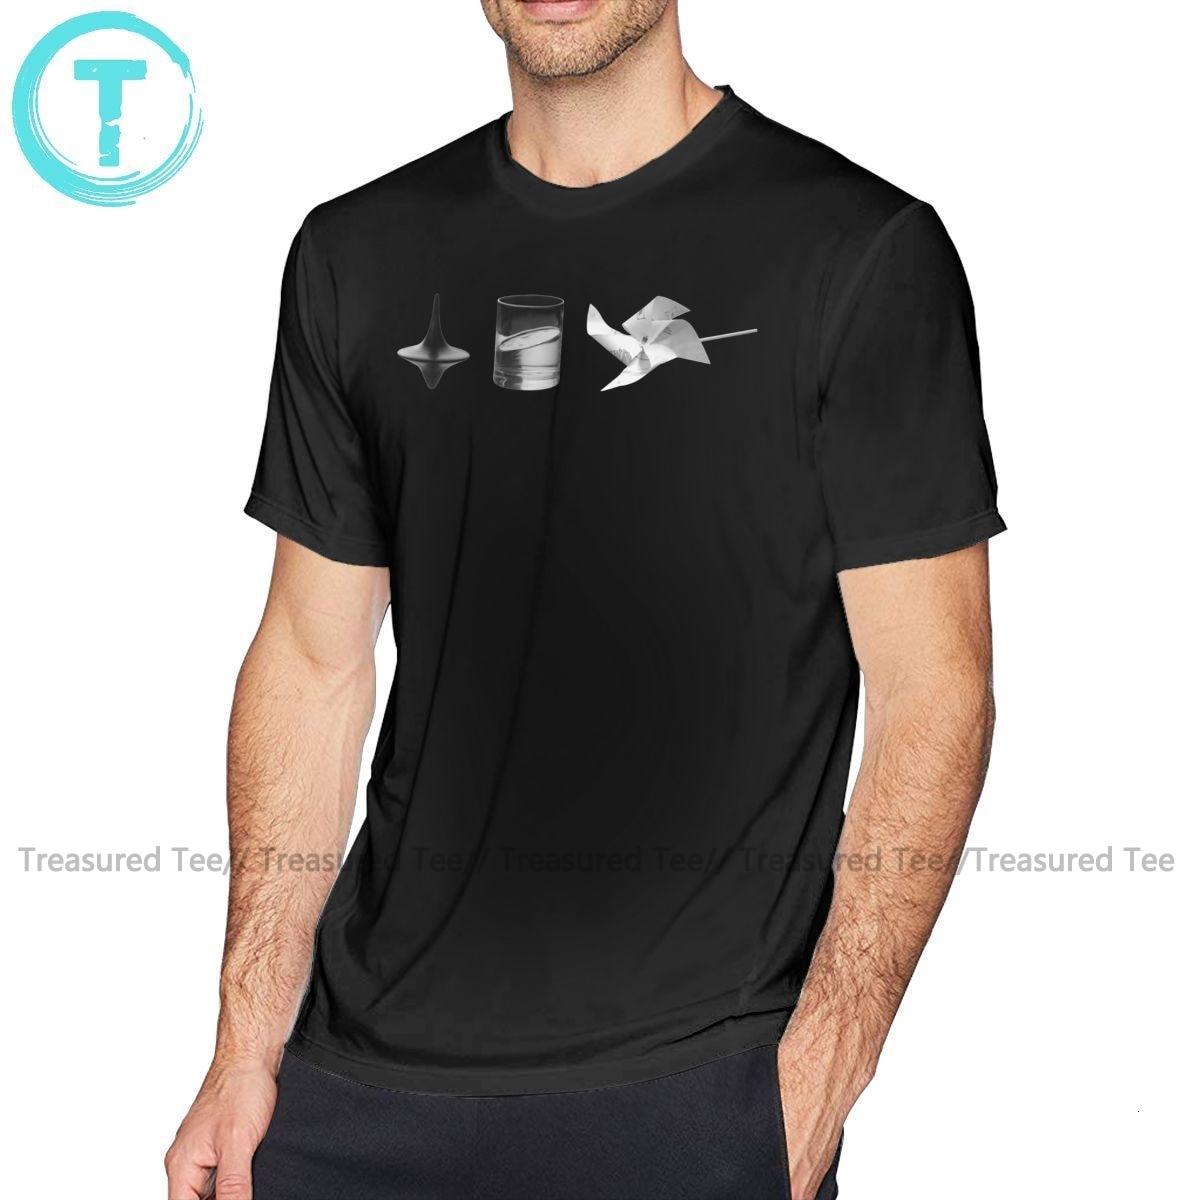 Inception Totem T Shirt Dreams T-Shirt Classic 100 Cotton Tee Shirt Printed Male Short-Sleeve Cute 5x Tshirt